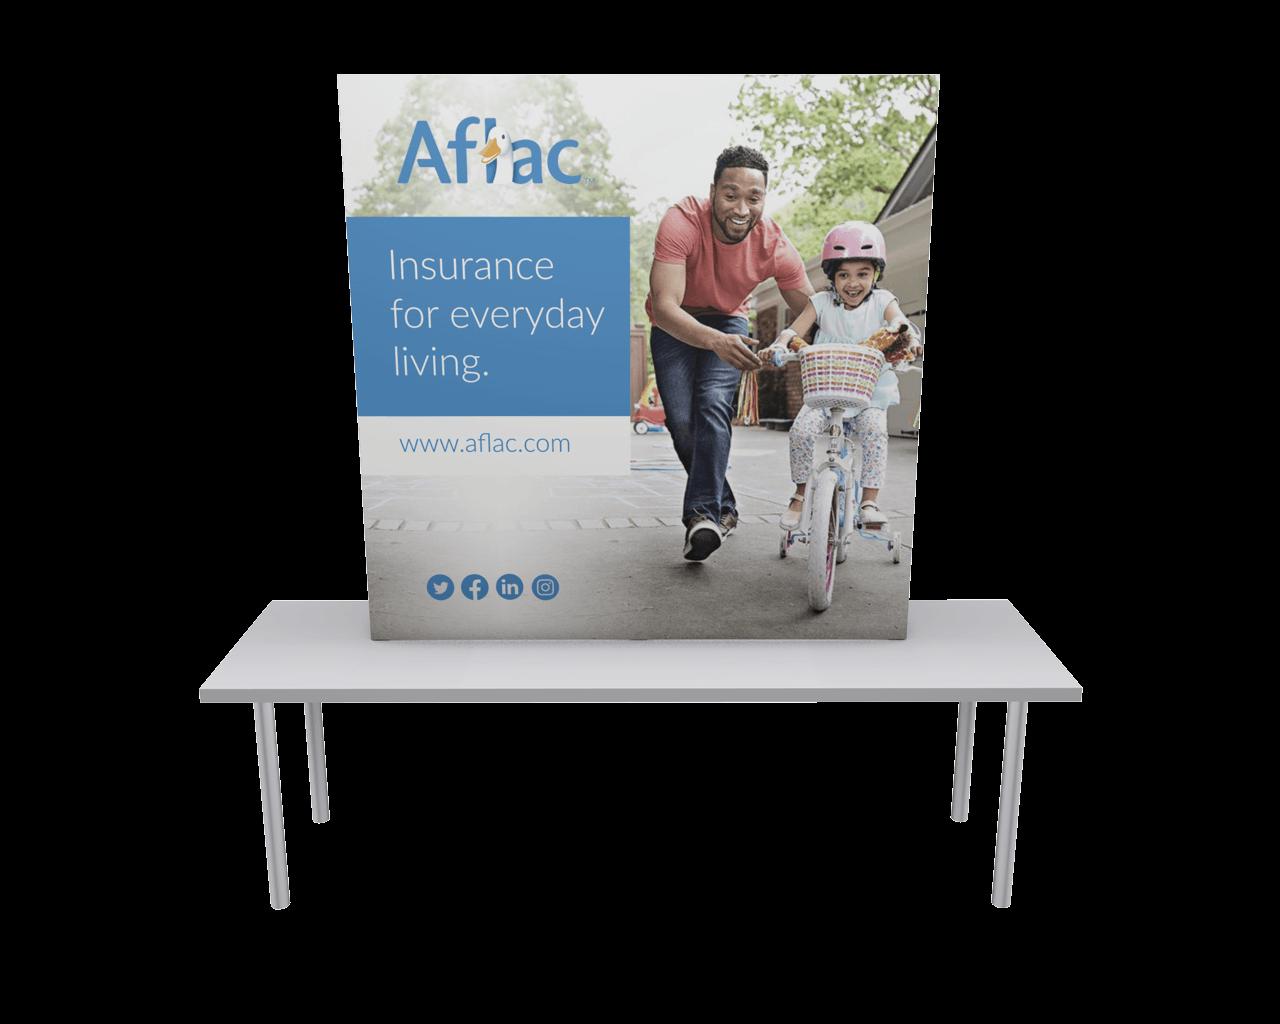 OneFabric 6ft Flat Tabletop Display